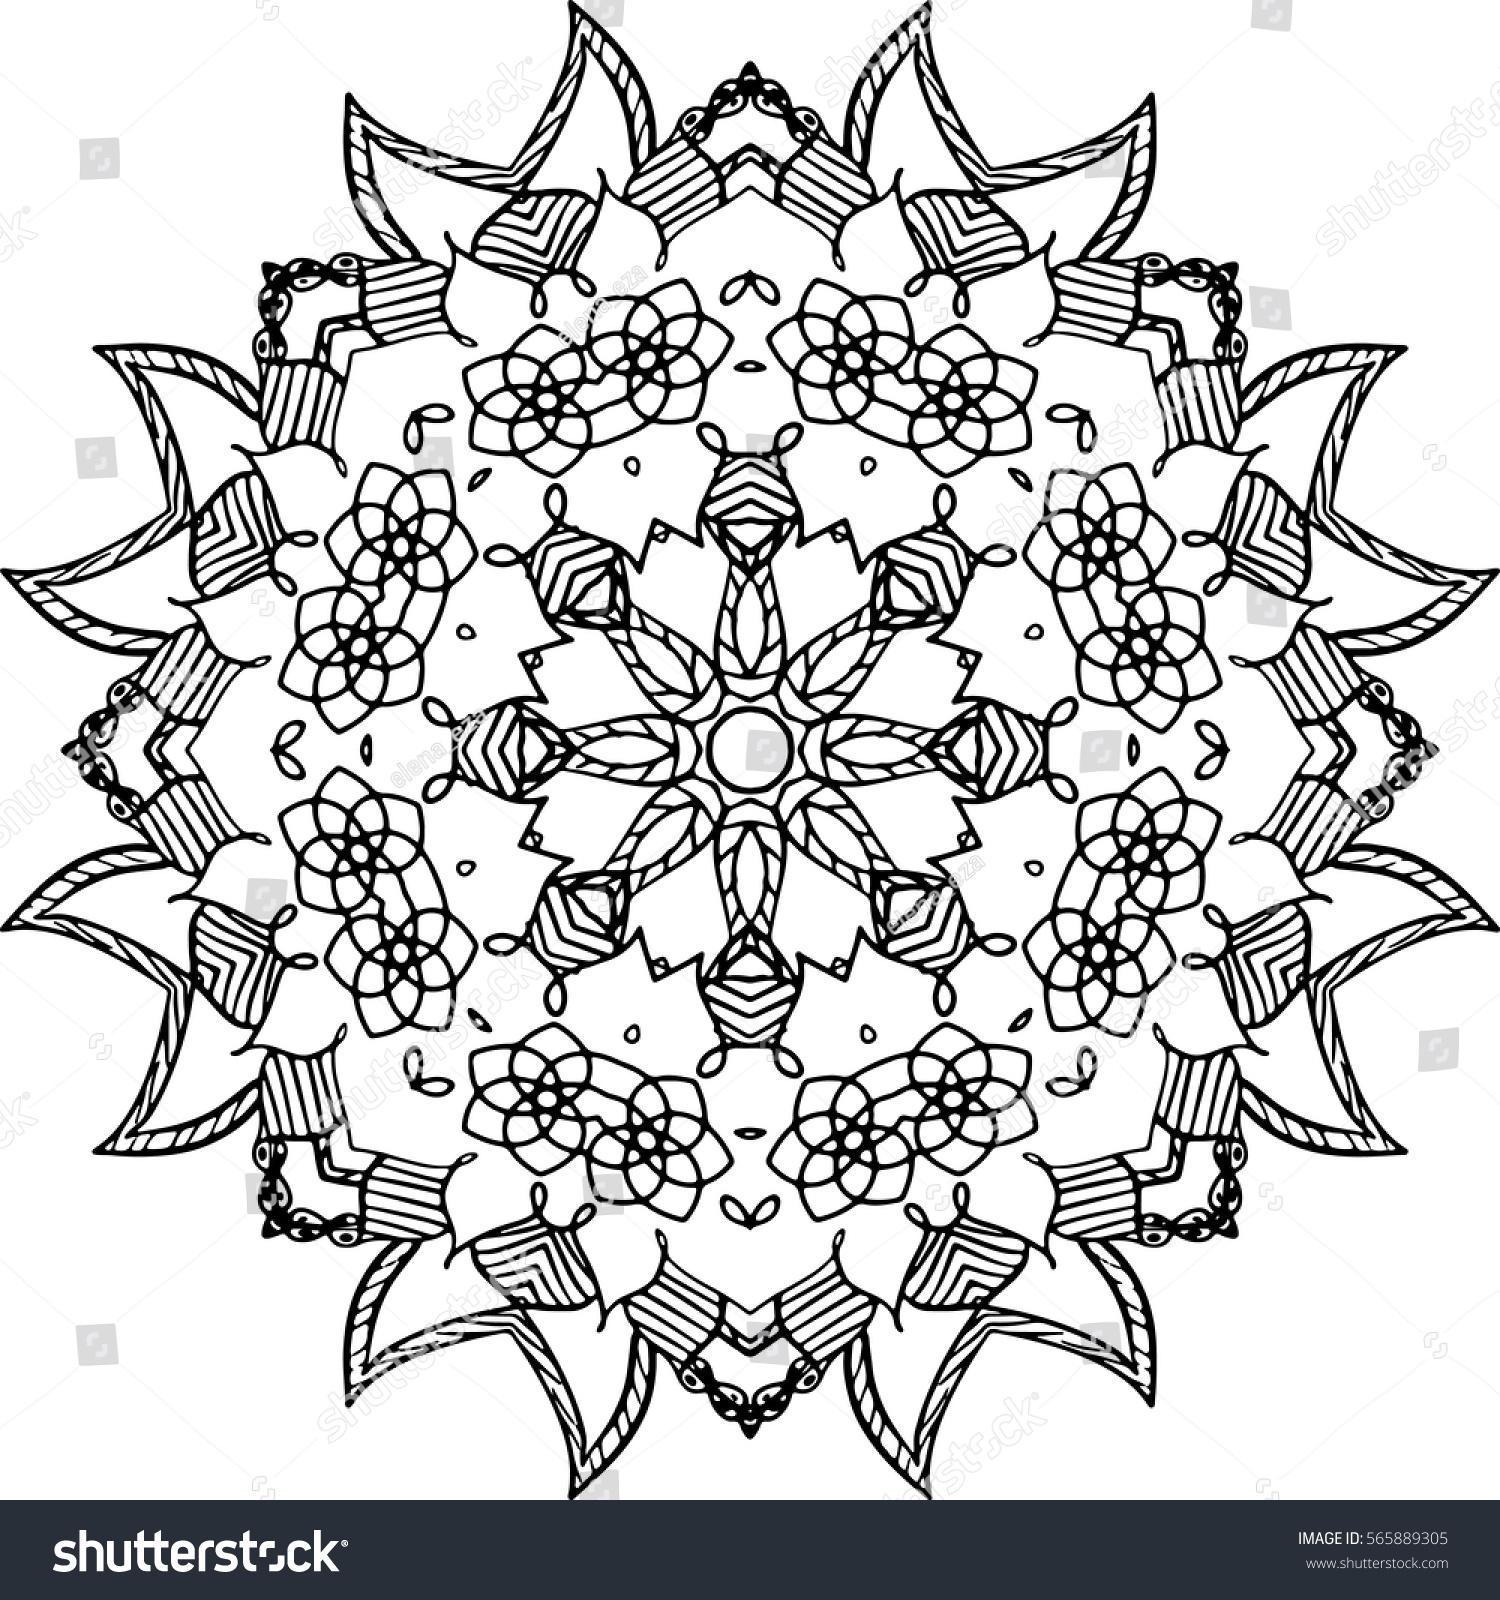 mandala illustration backgrounds coloring books pattern stock